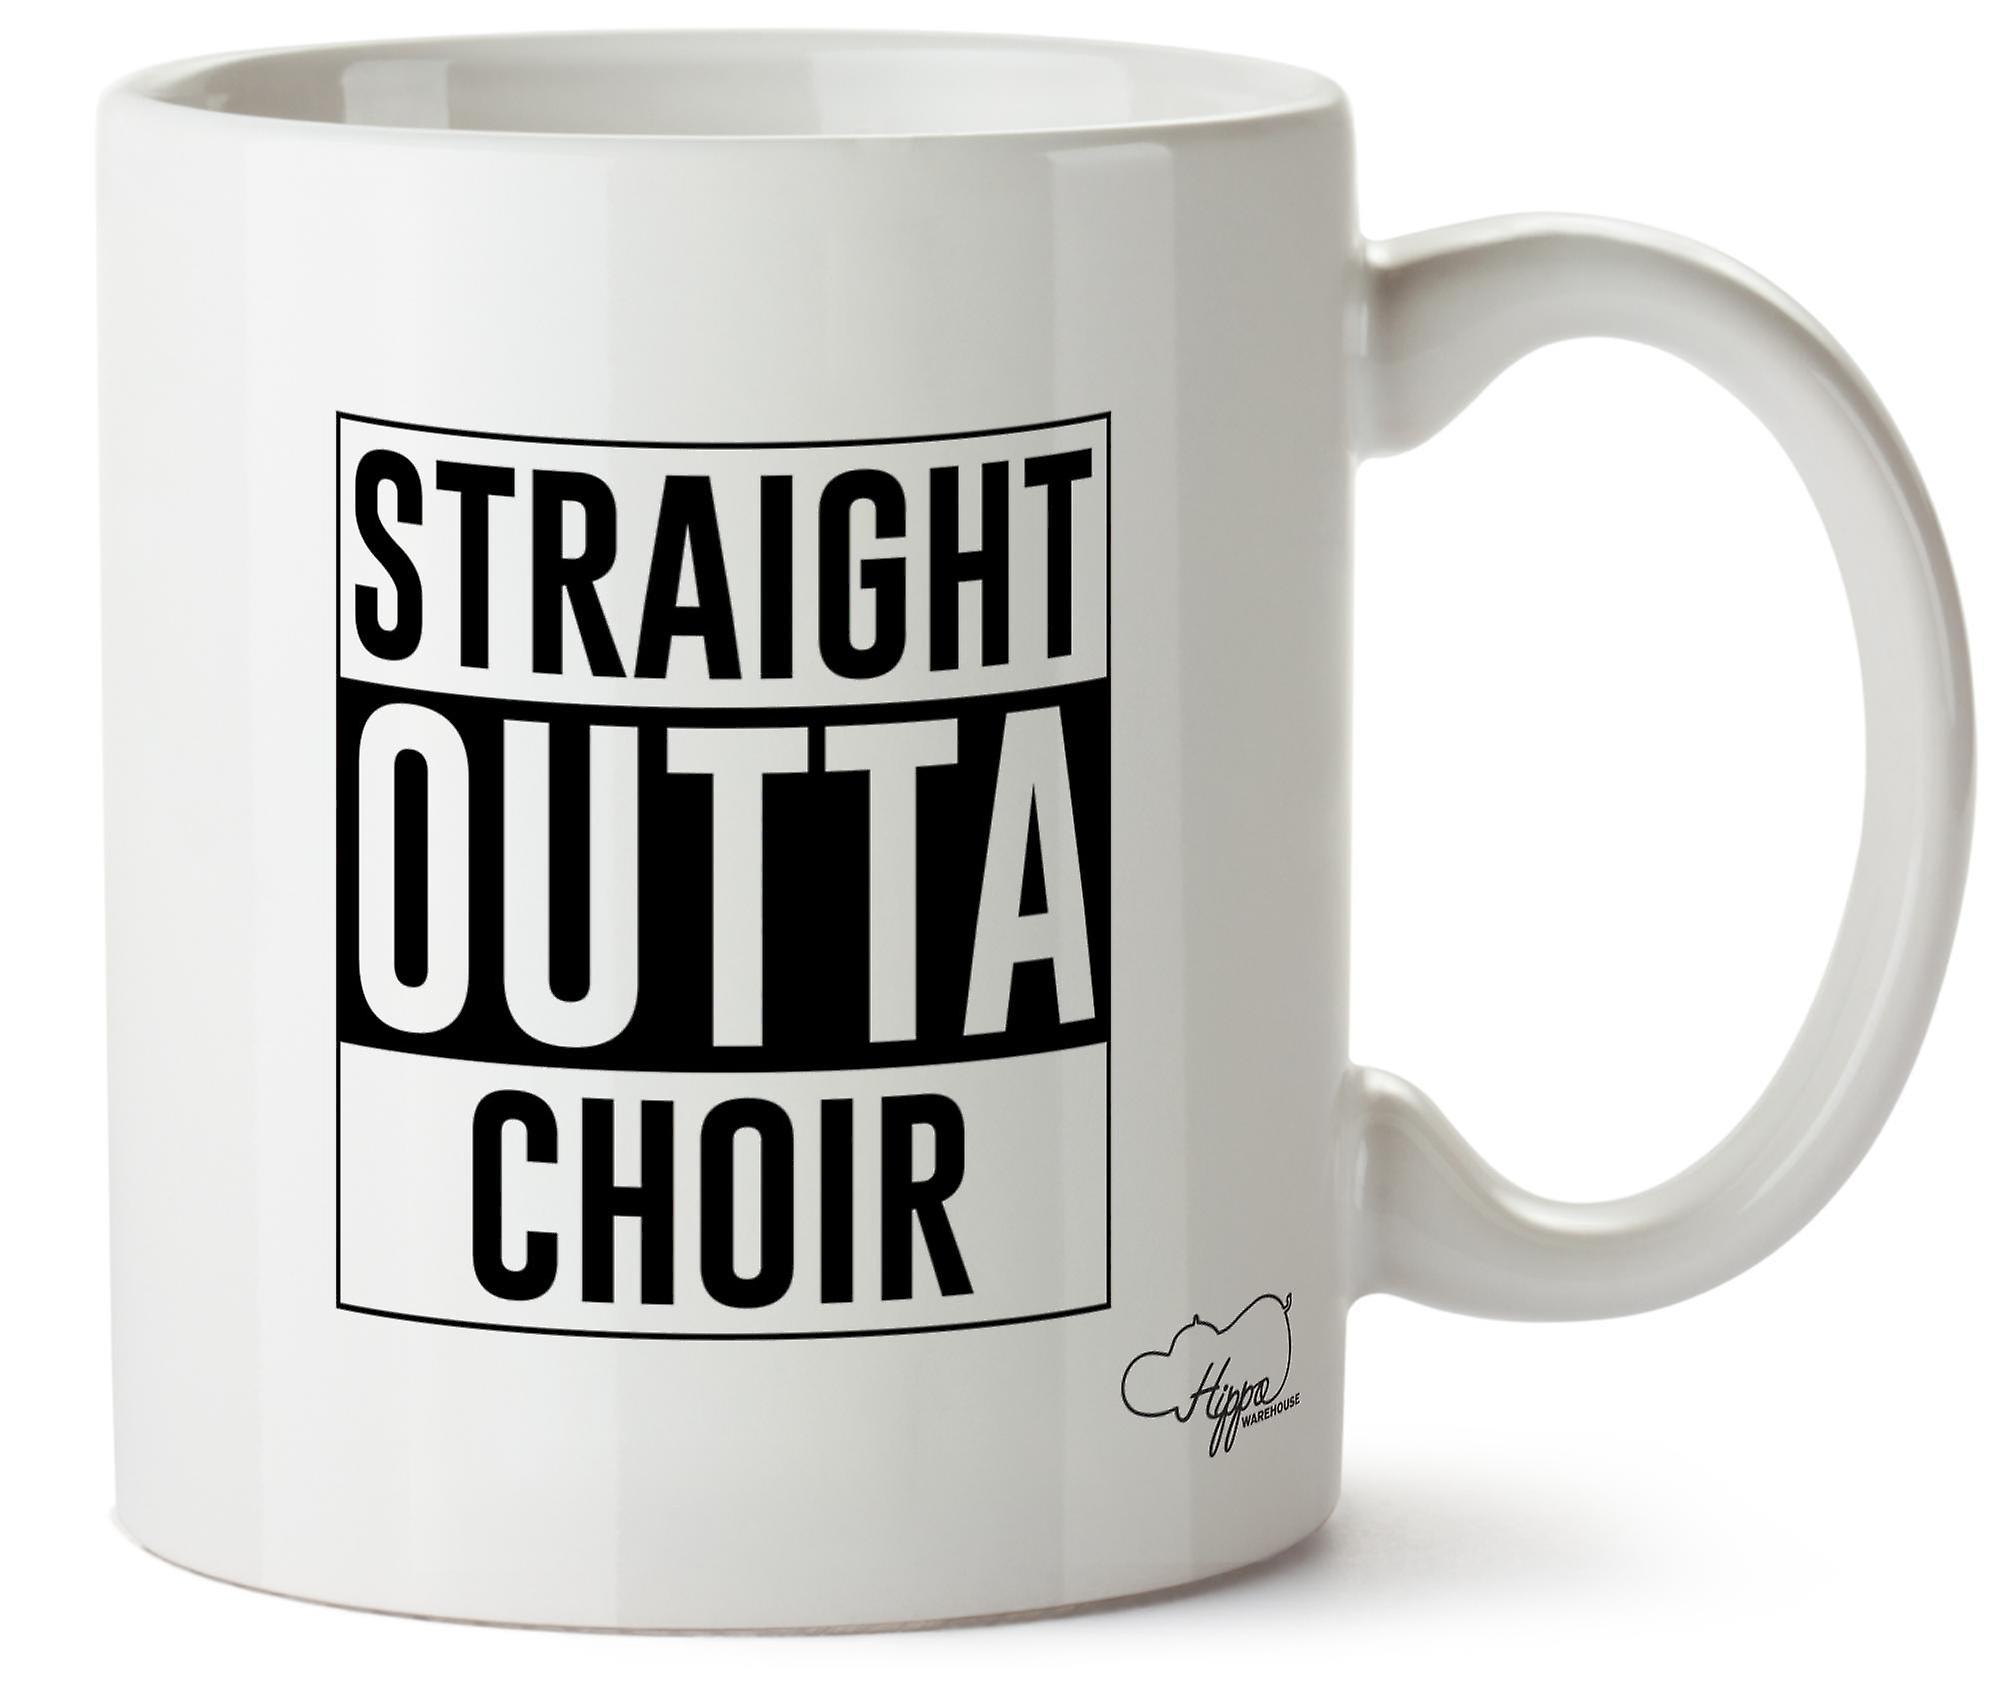 Hippowarehouse Straight Outta Choir Printed Mug Cup Ceramic 10oz